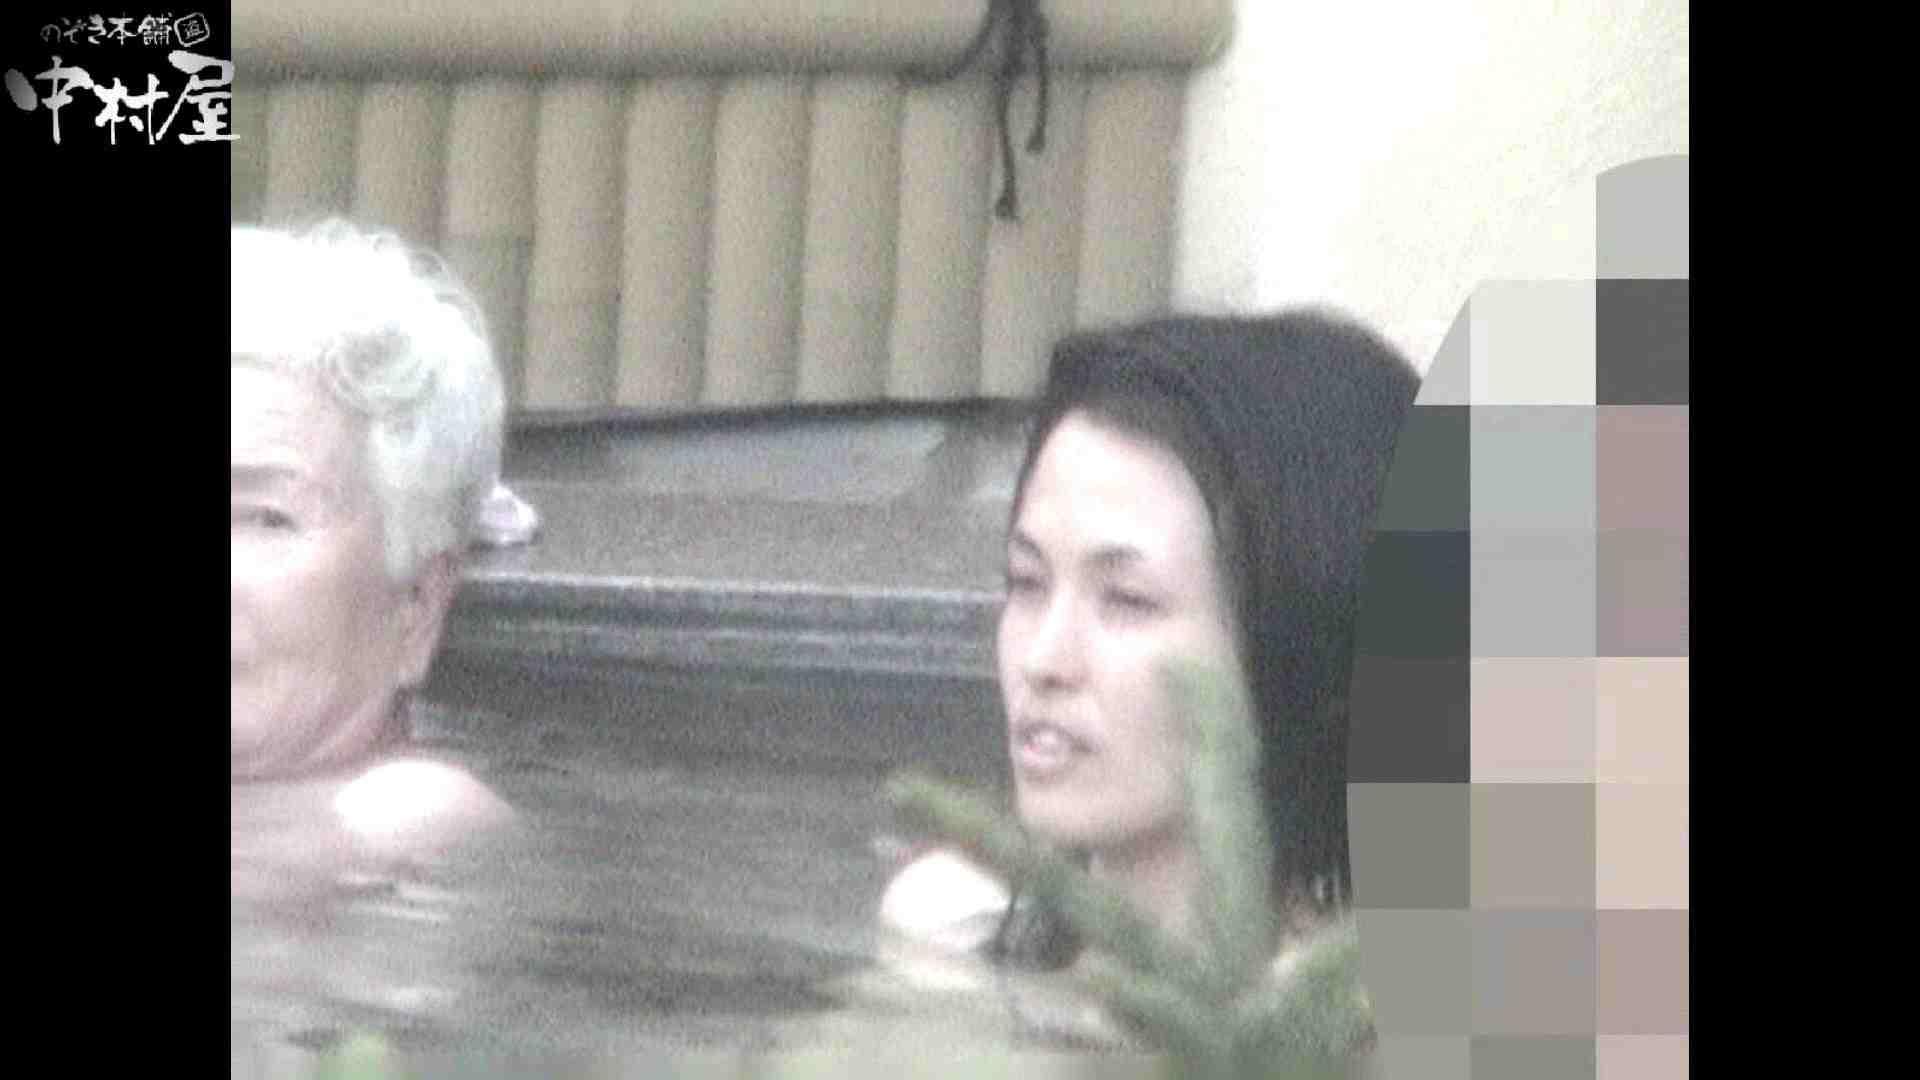 Aquaな露天風呂Vol.933 盗撮 おまんこ動画流出 78PICs 62